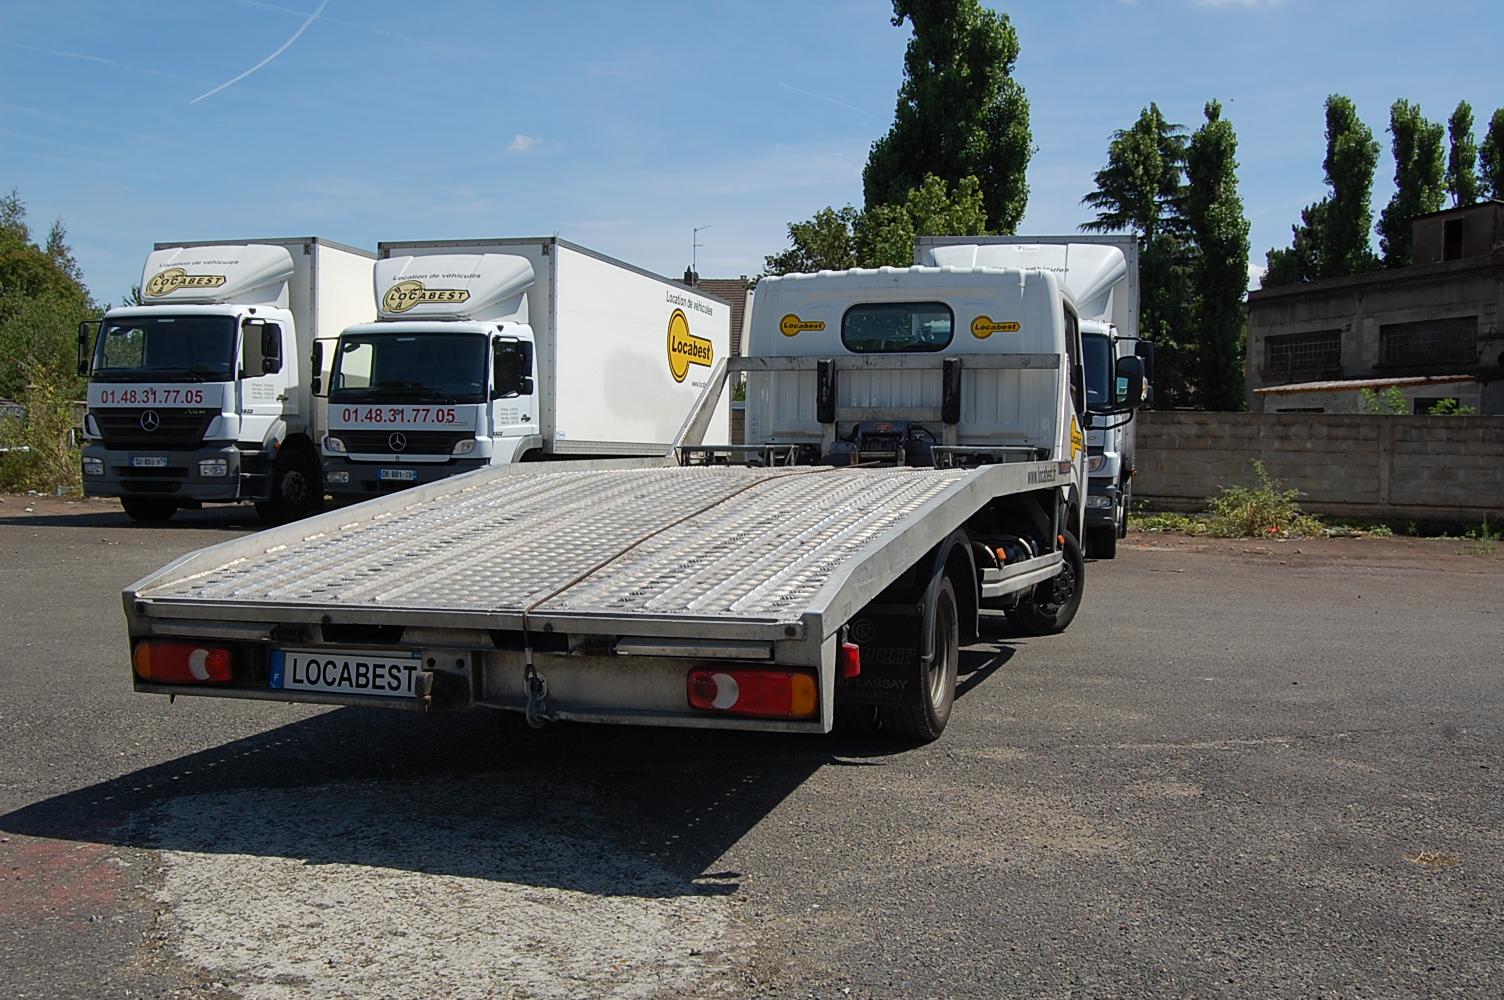 location camion voiture location auto clermont. Black Bedroom Furniture Sets. Home Design Ideas